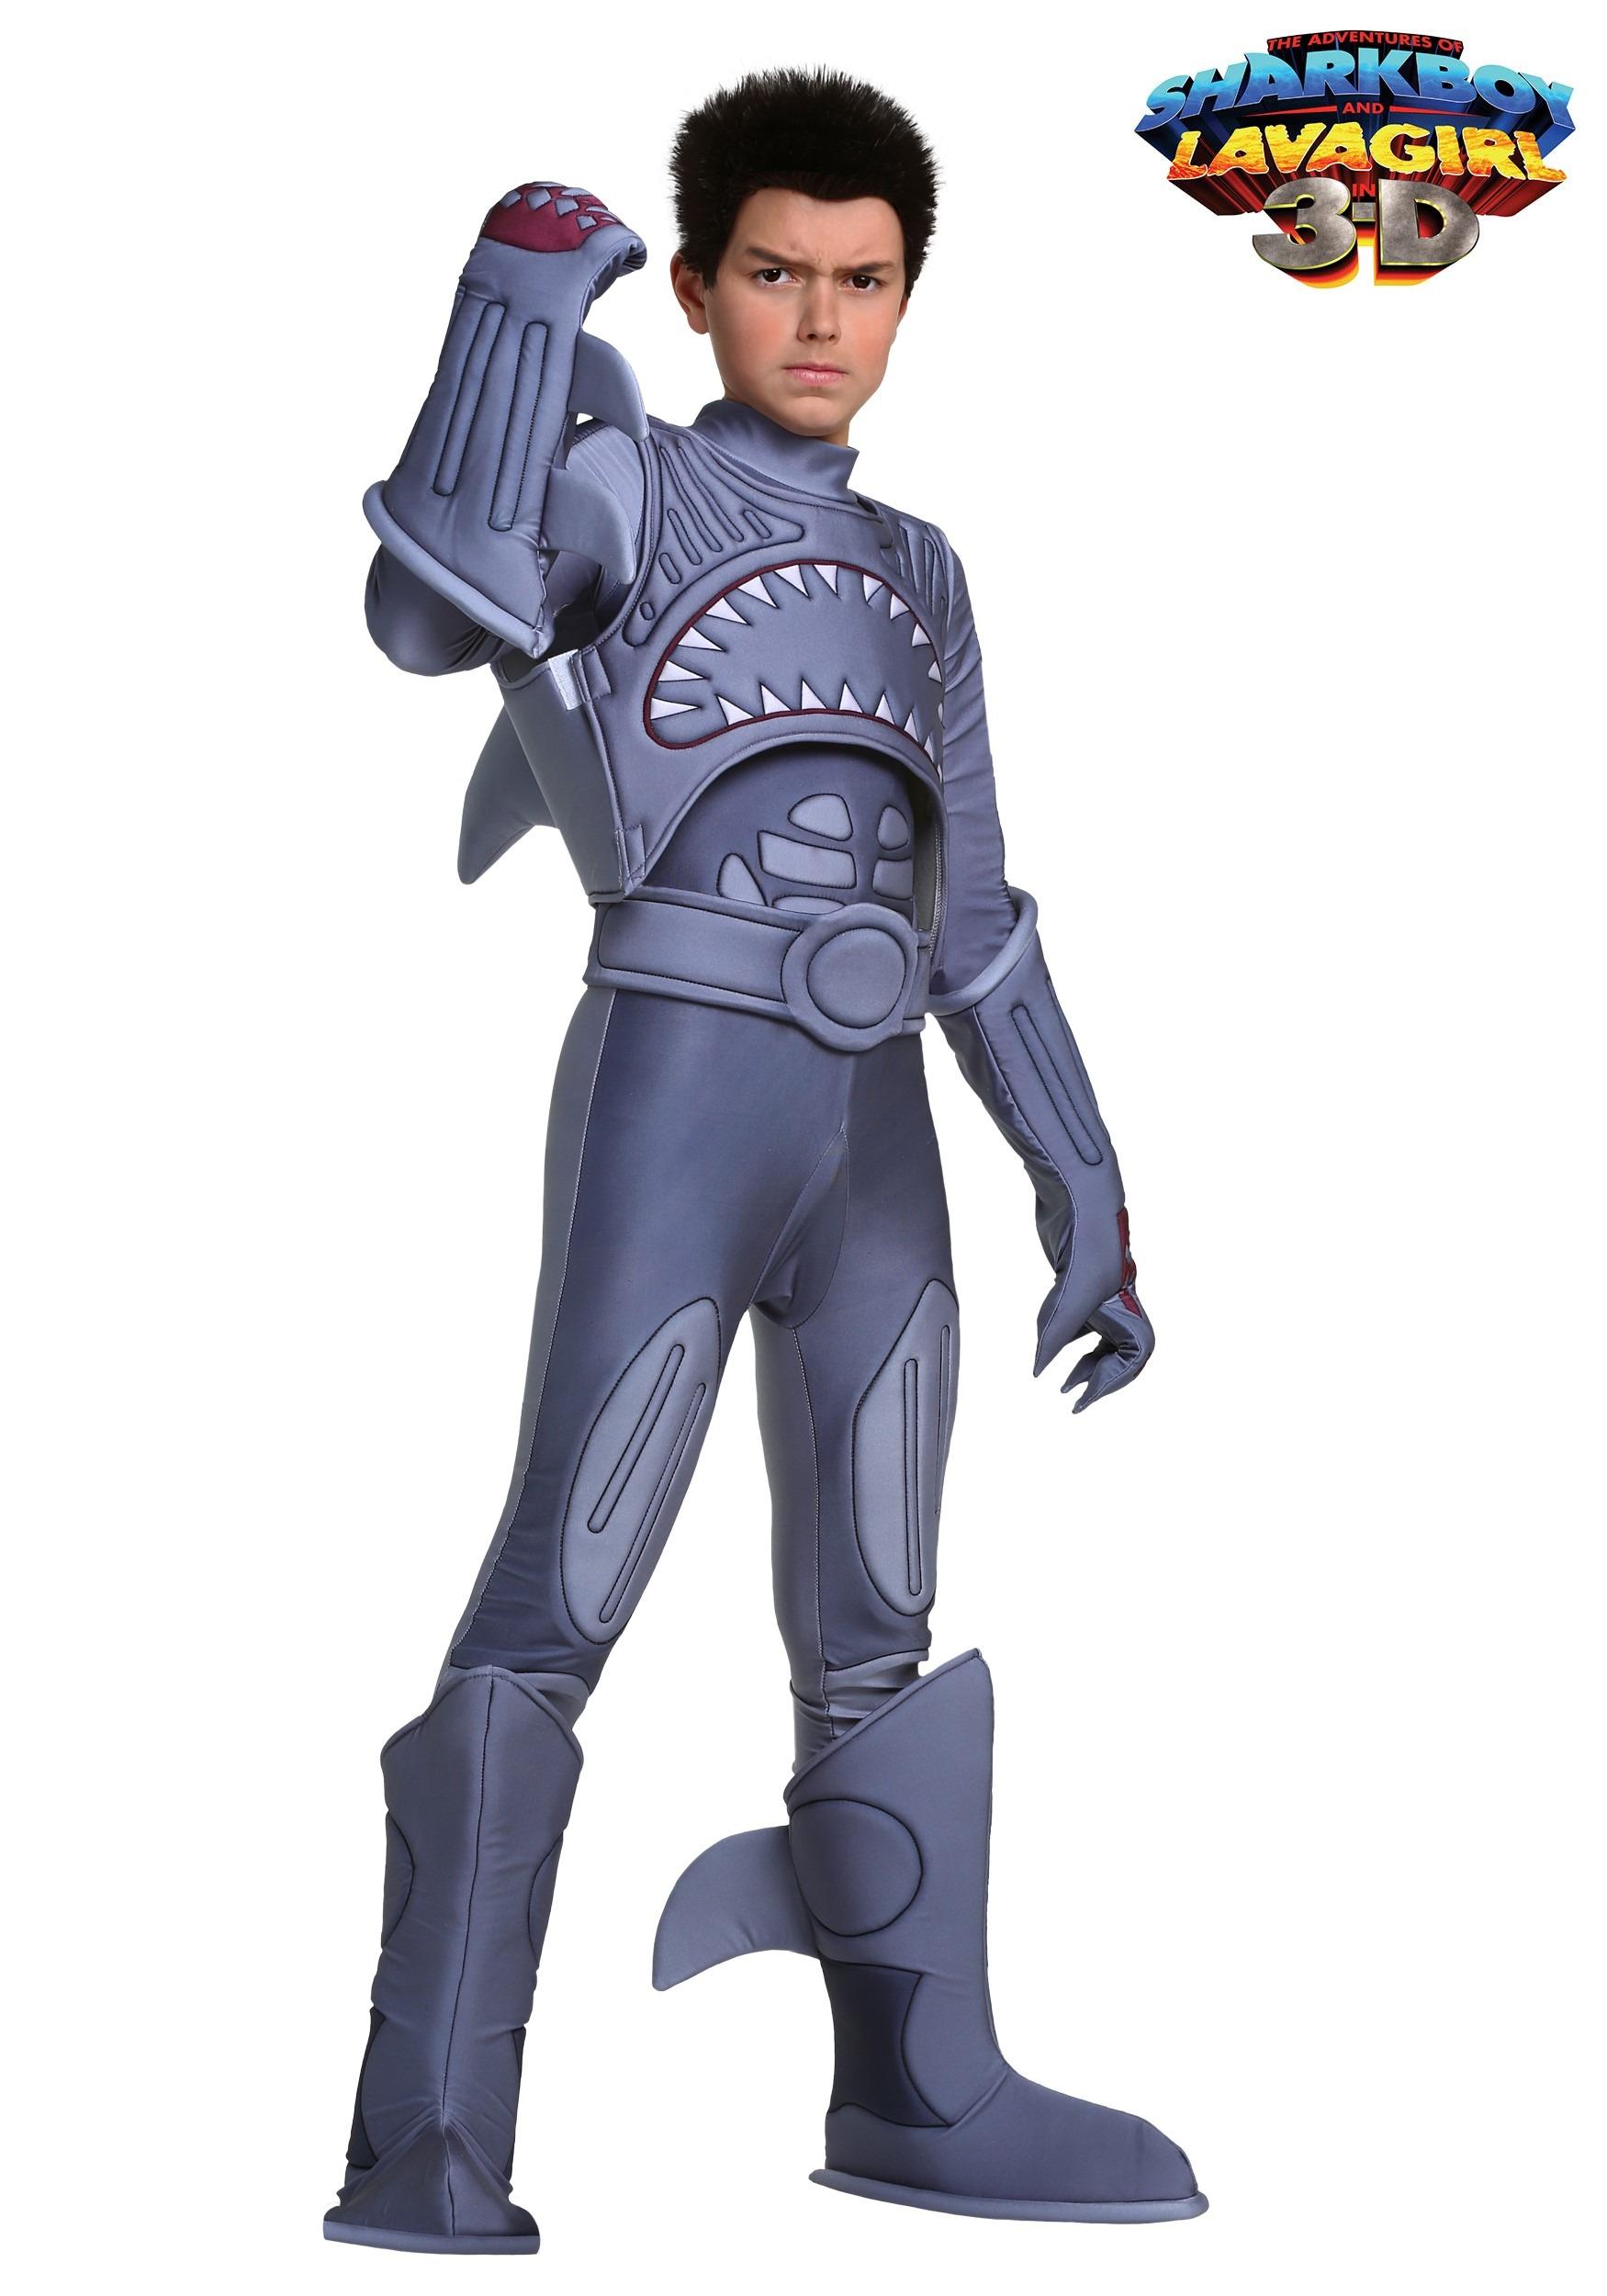 Sharkboy Costume For Boys-7467